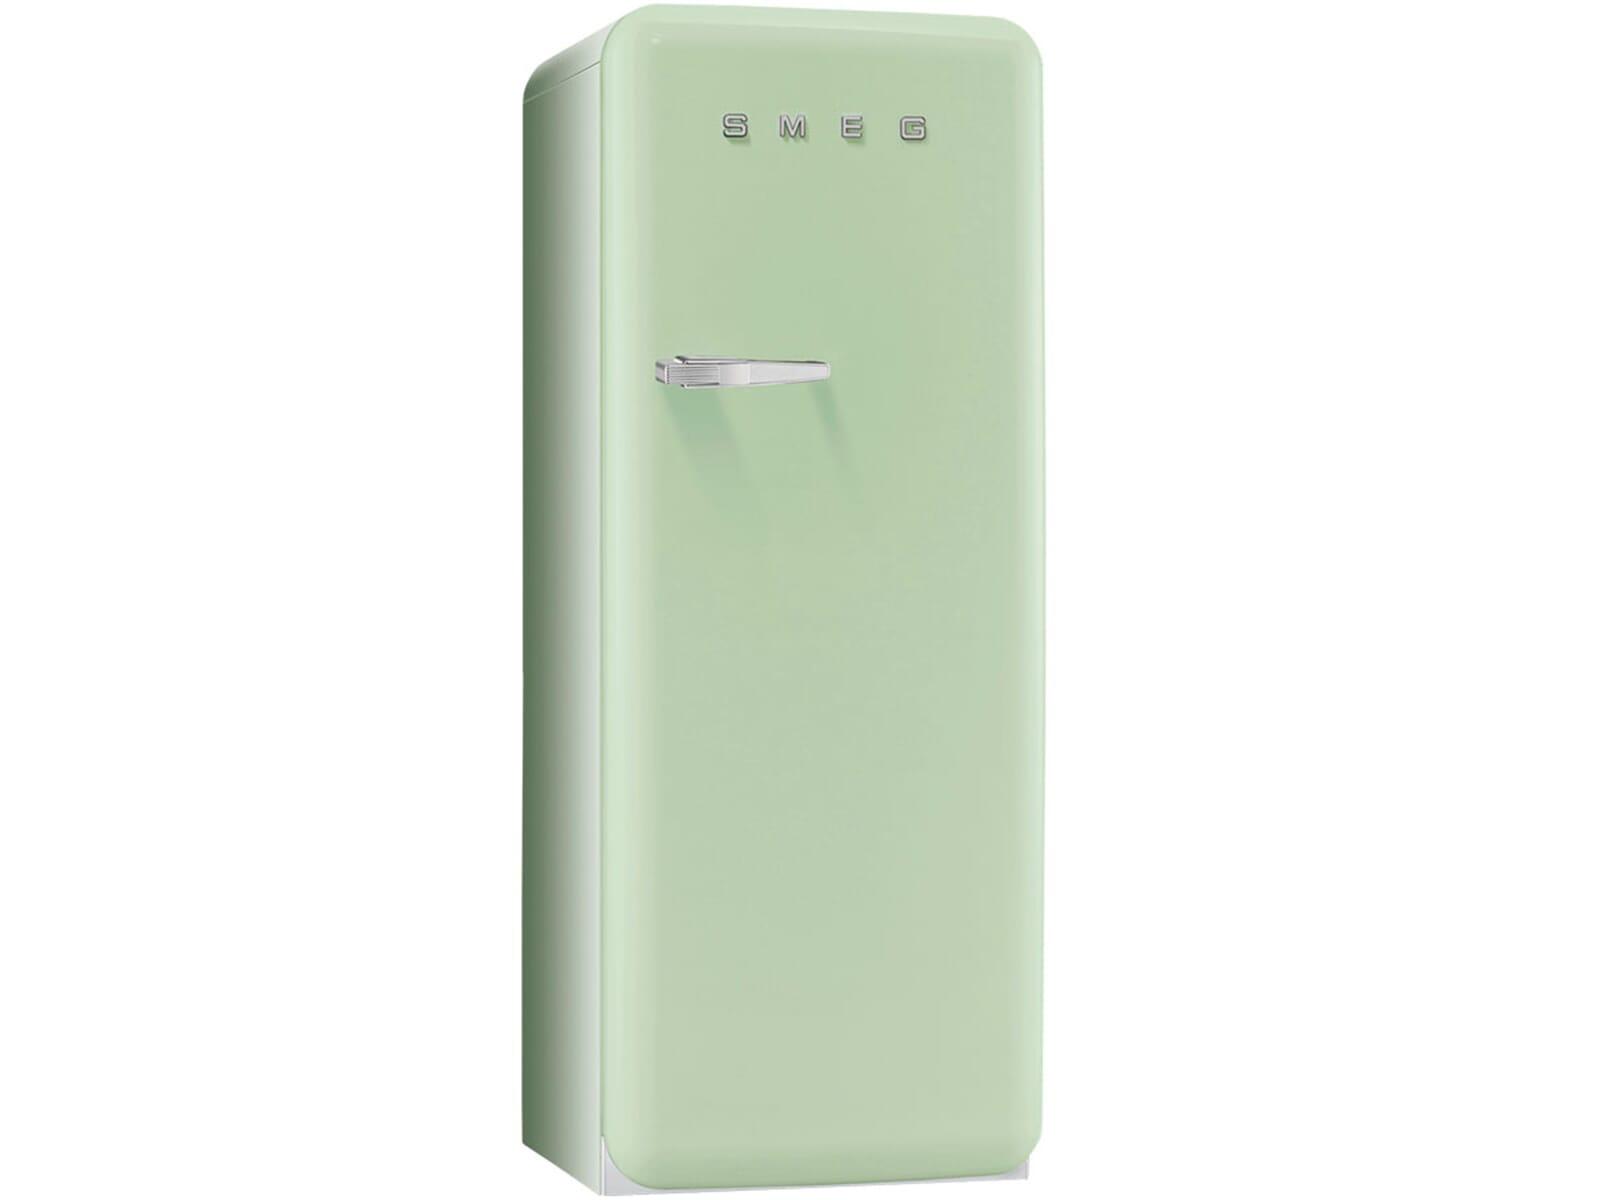 Siemens Retro Kühlschrank : Kühlschrank farbe florence fox